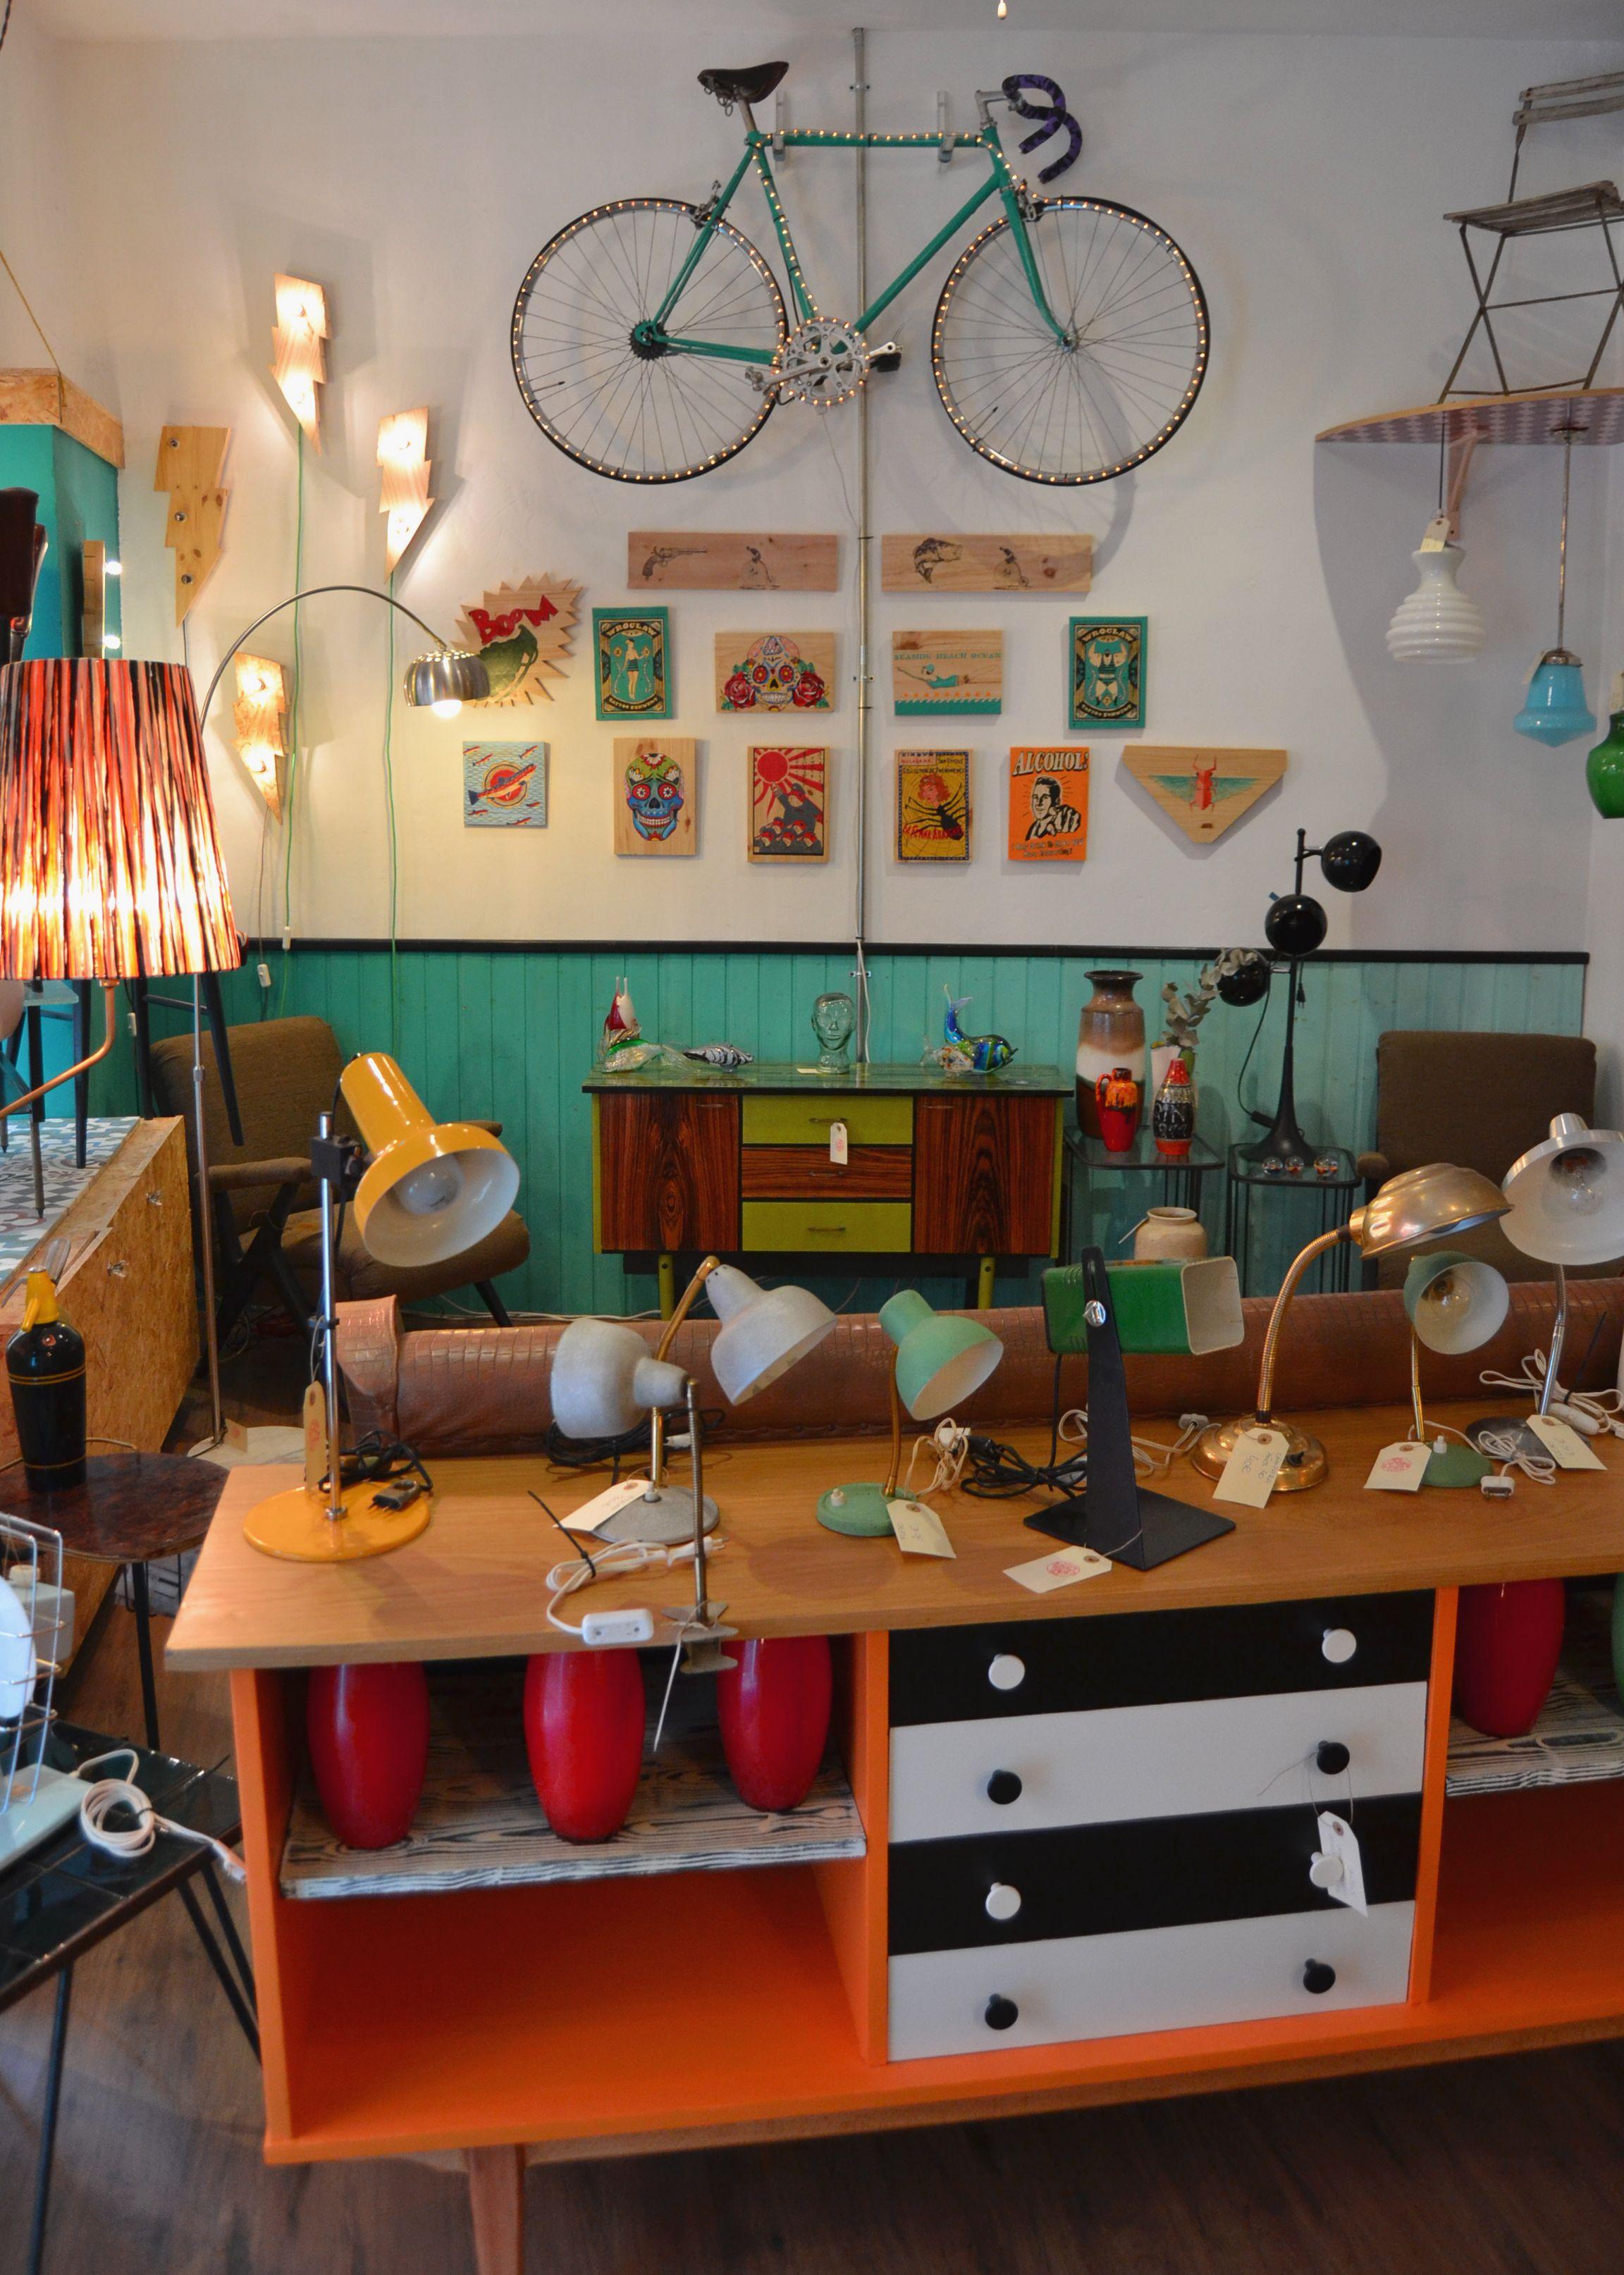 Flexeando iluminaci n retro vintage decoraci n furniture lamps decoration tienda - Centro reto madrid recogida muebles ...